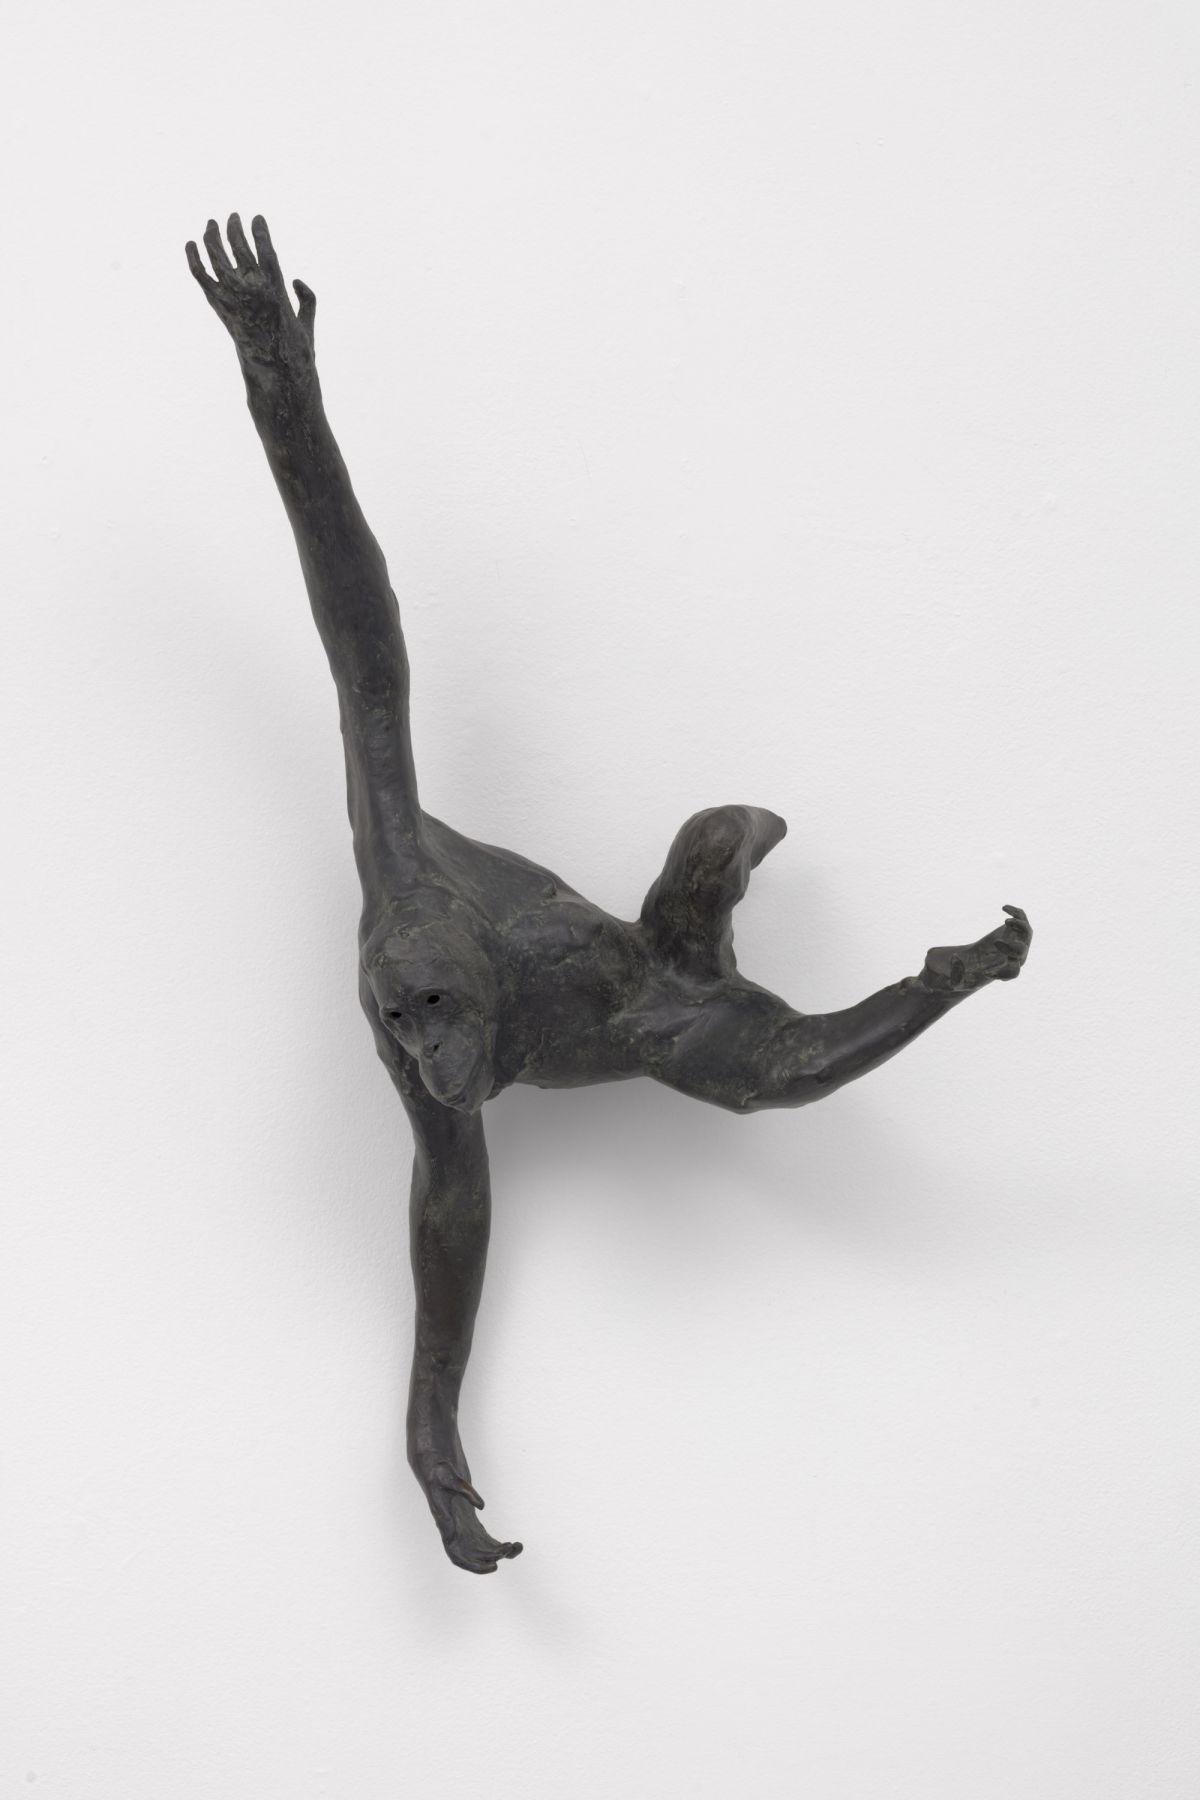 leaping bronze primate sculpture